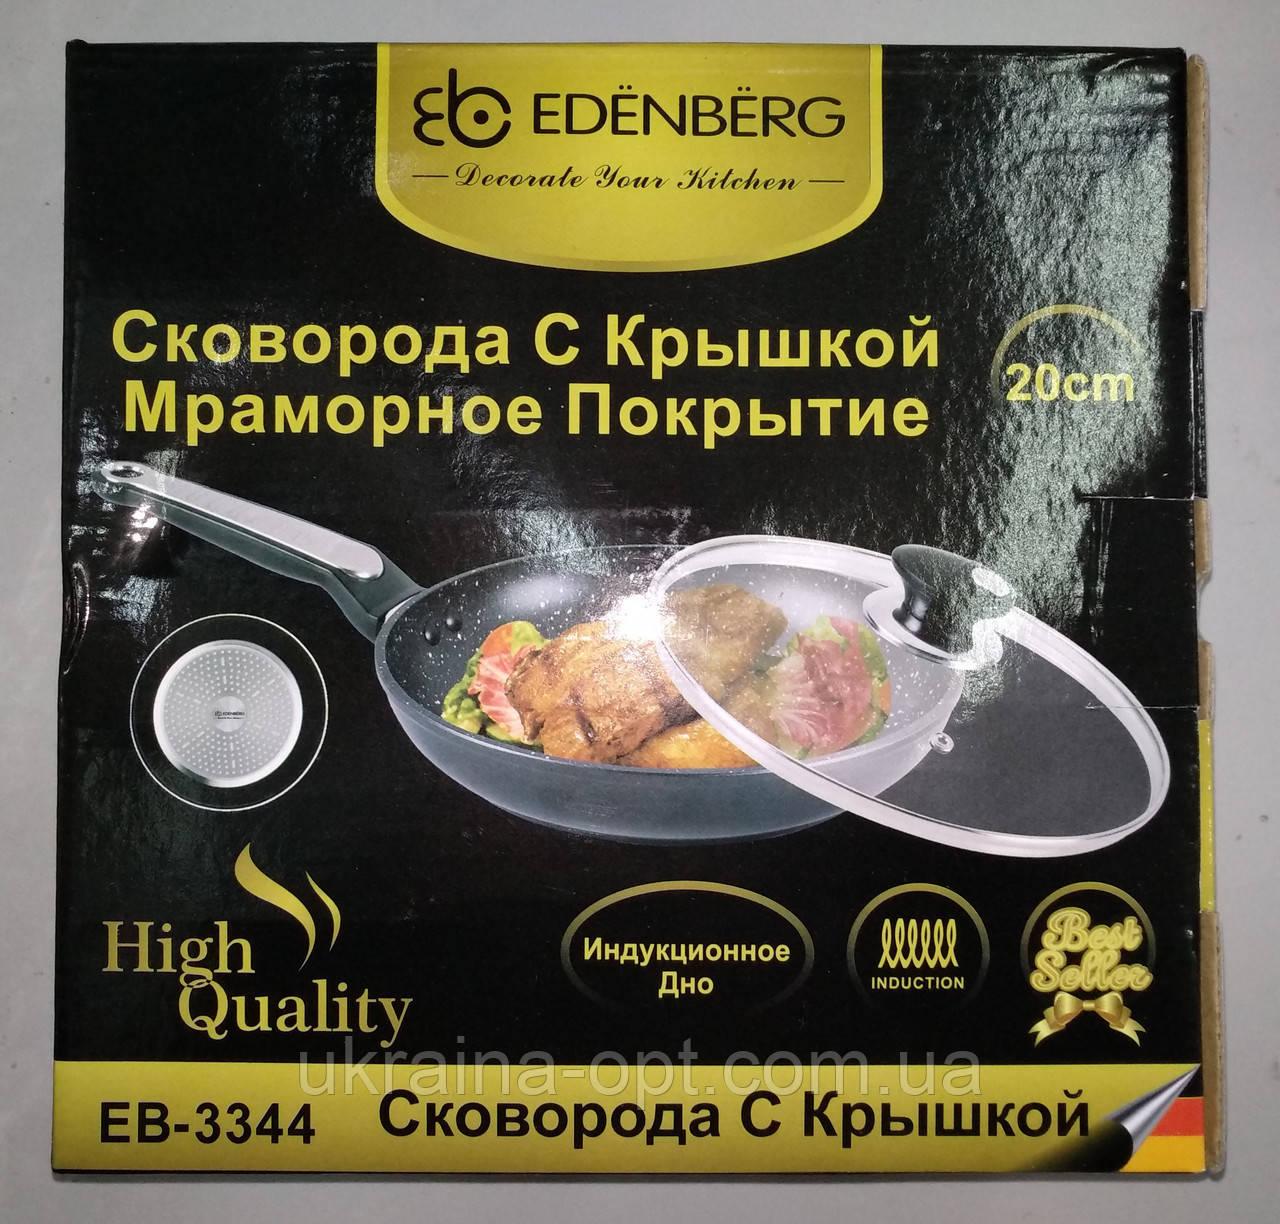 Сковорода с крышкой EDENBERG EB-3344, 20 см (мрамор)